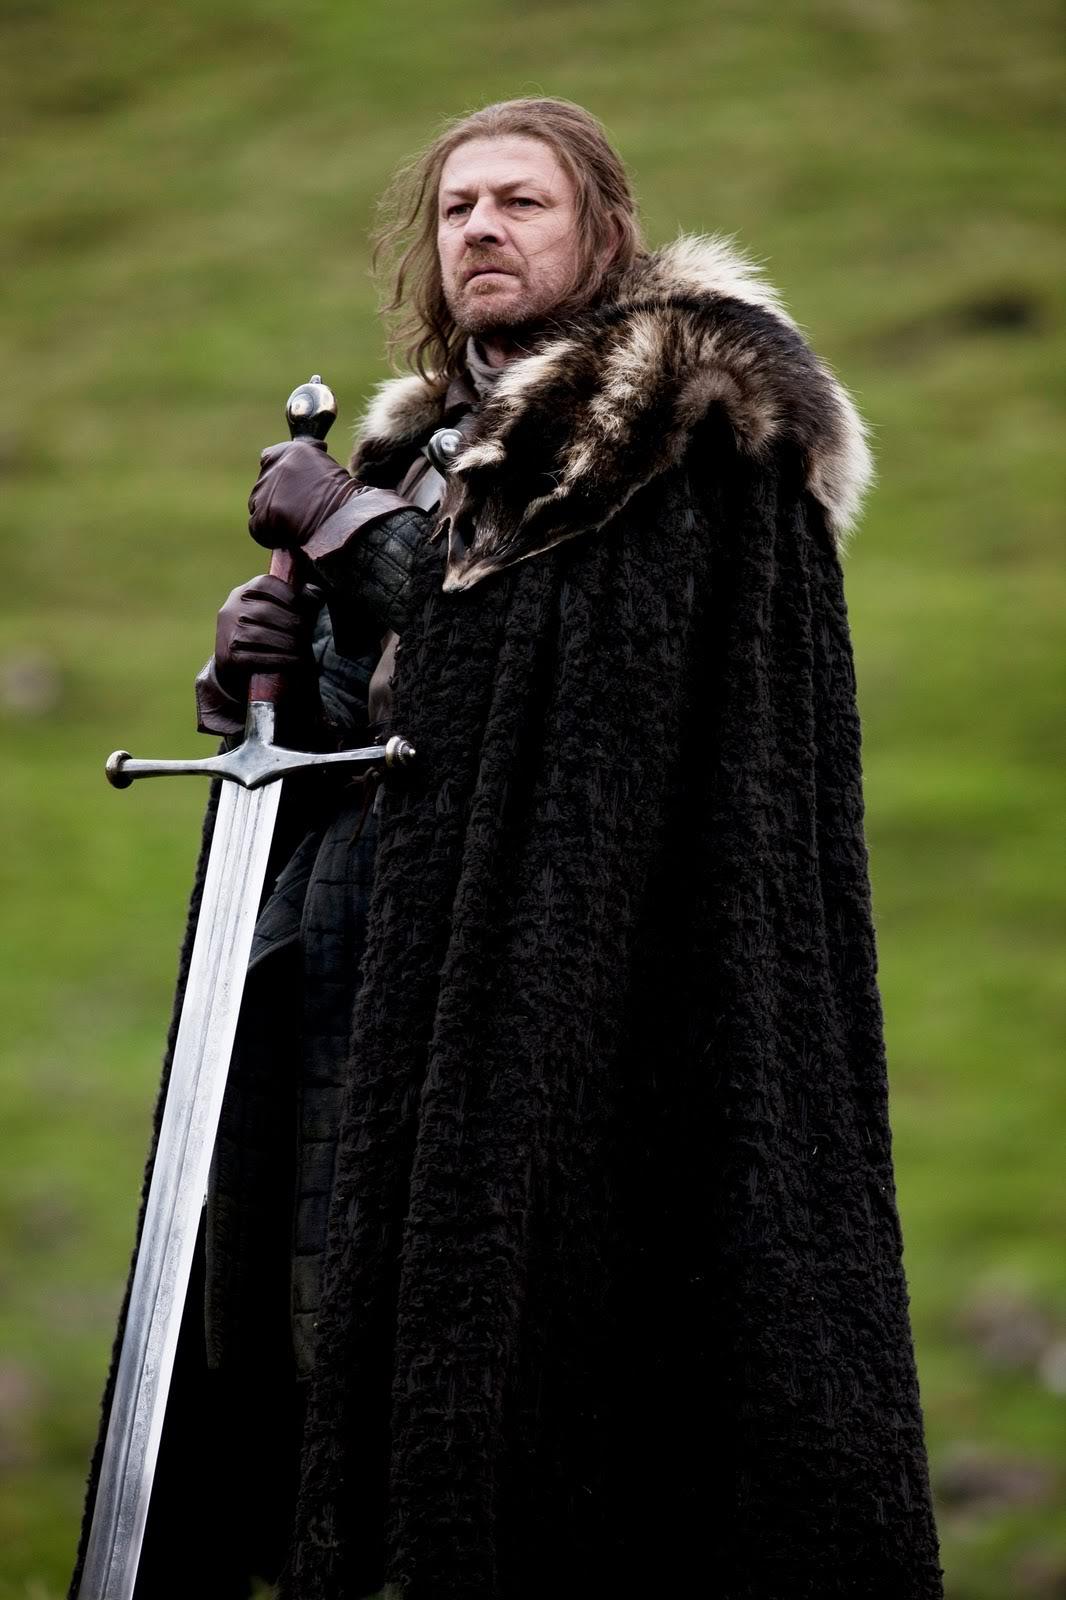 Game of thrones top 5 most memorable scenes